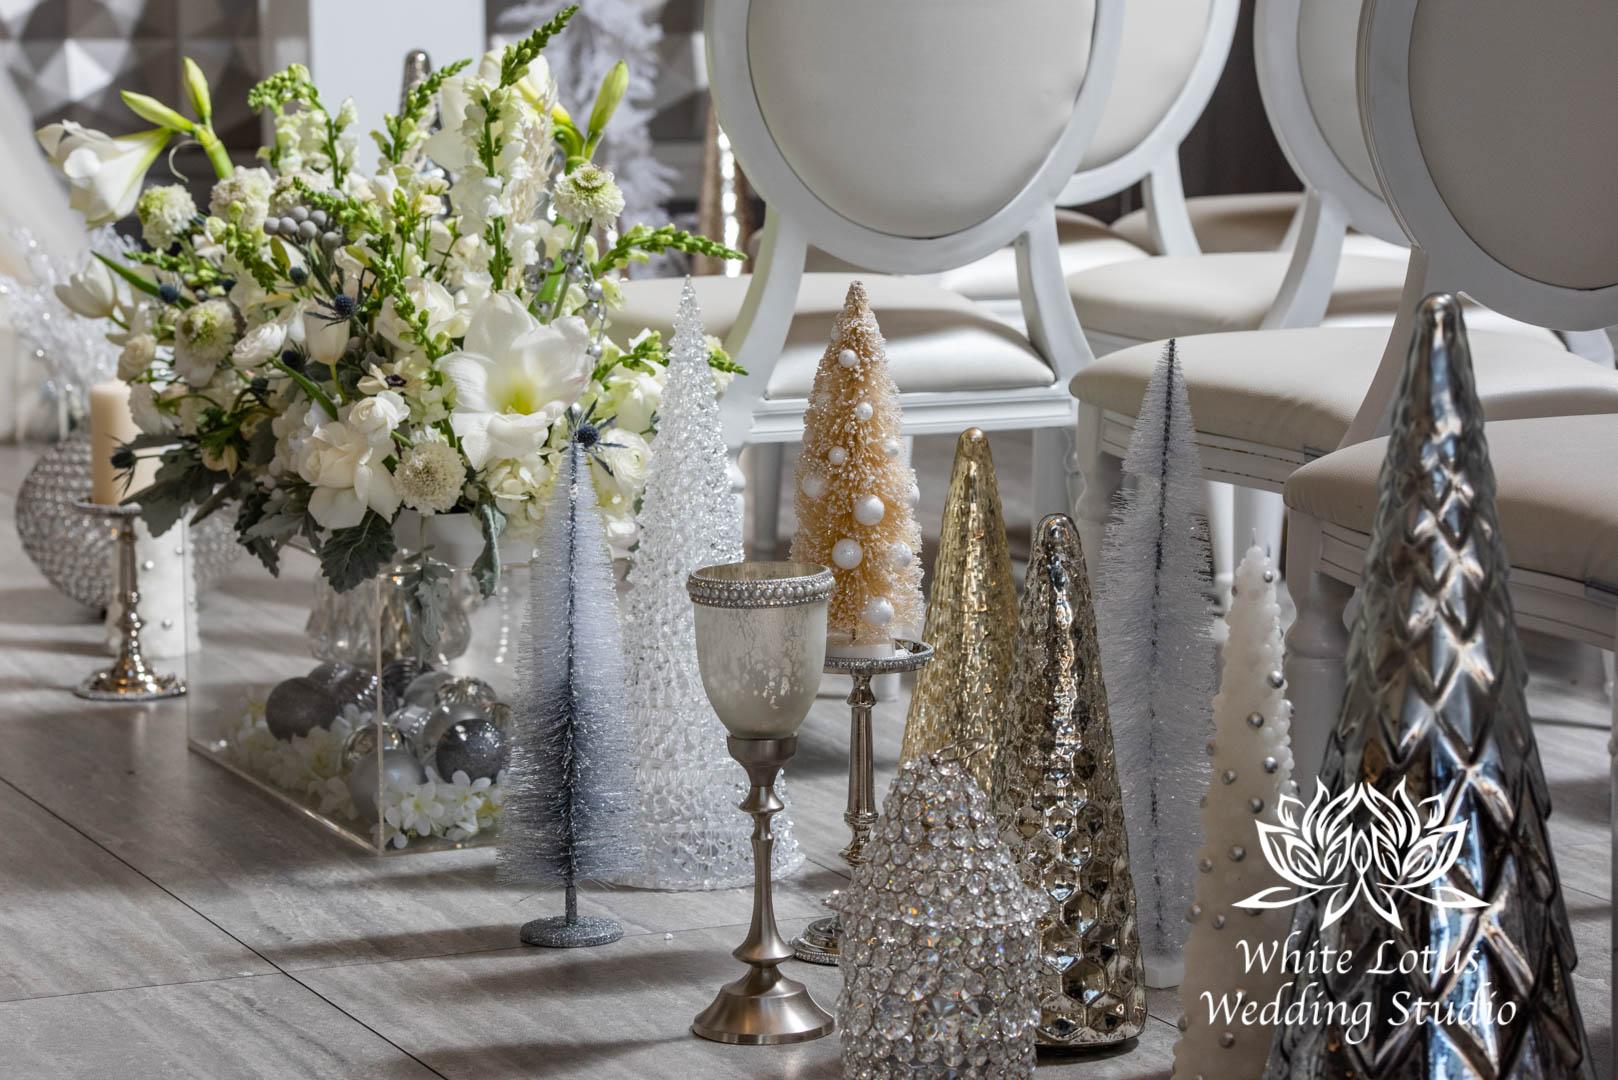 028- GLAM WINTERLUXE WEDDING INSPIRATION